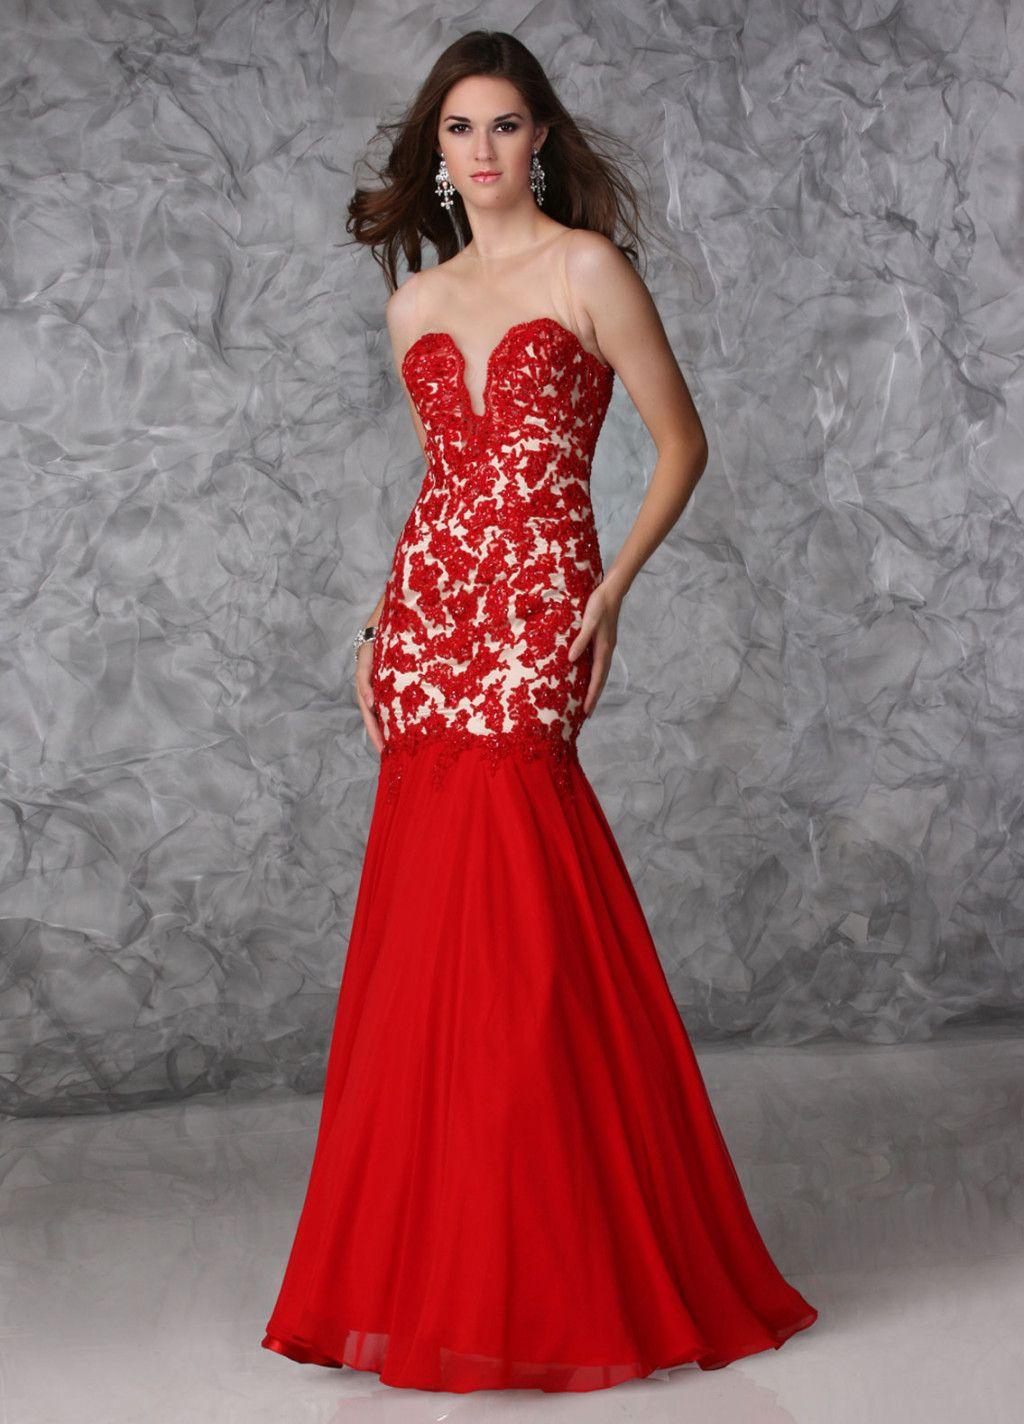 Long Red Prom Dresses Under 100 Photo Album - Reikian